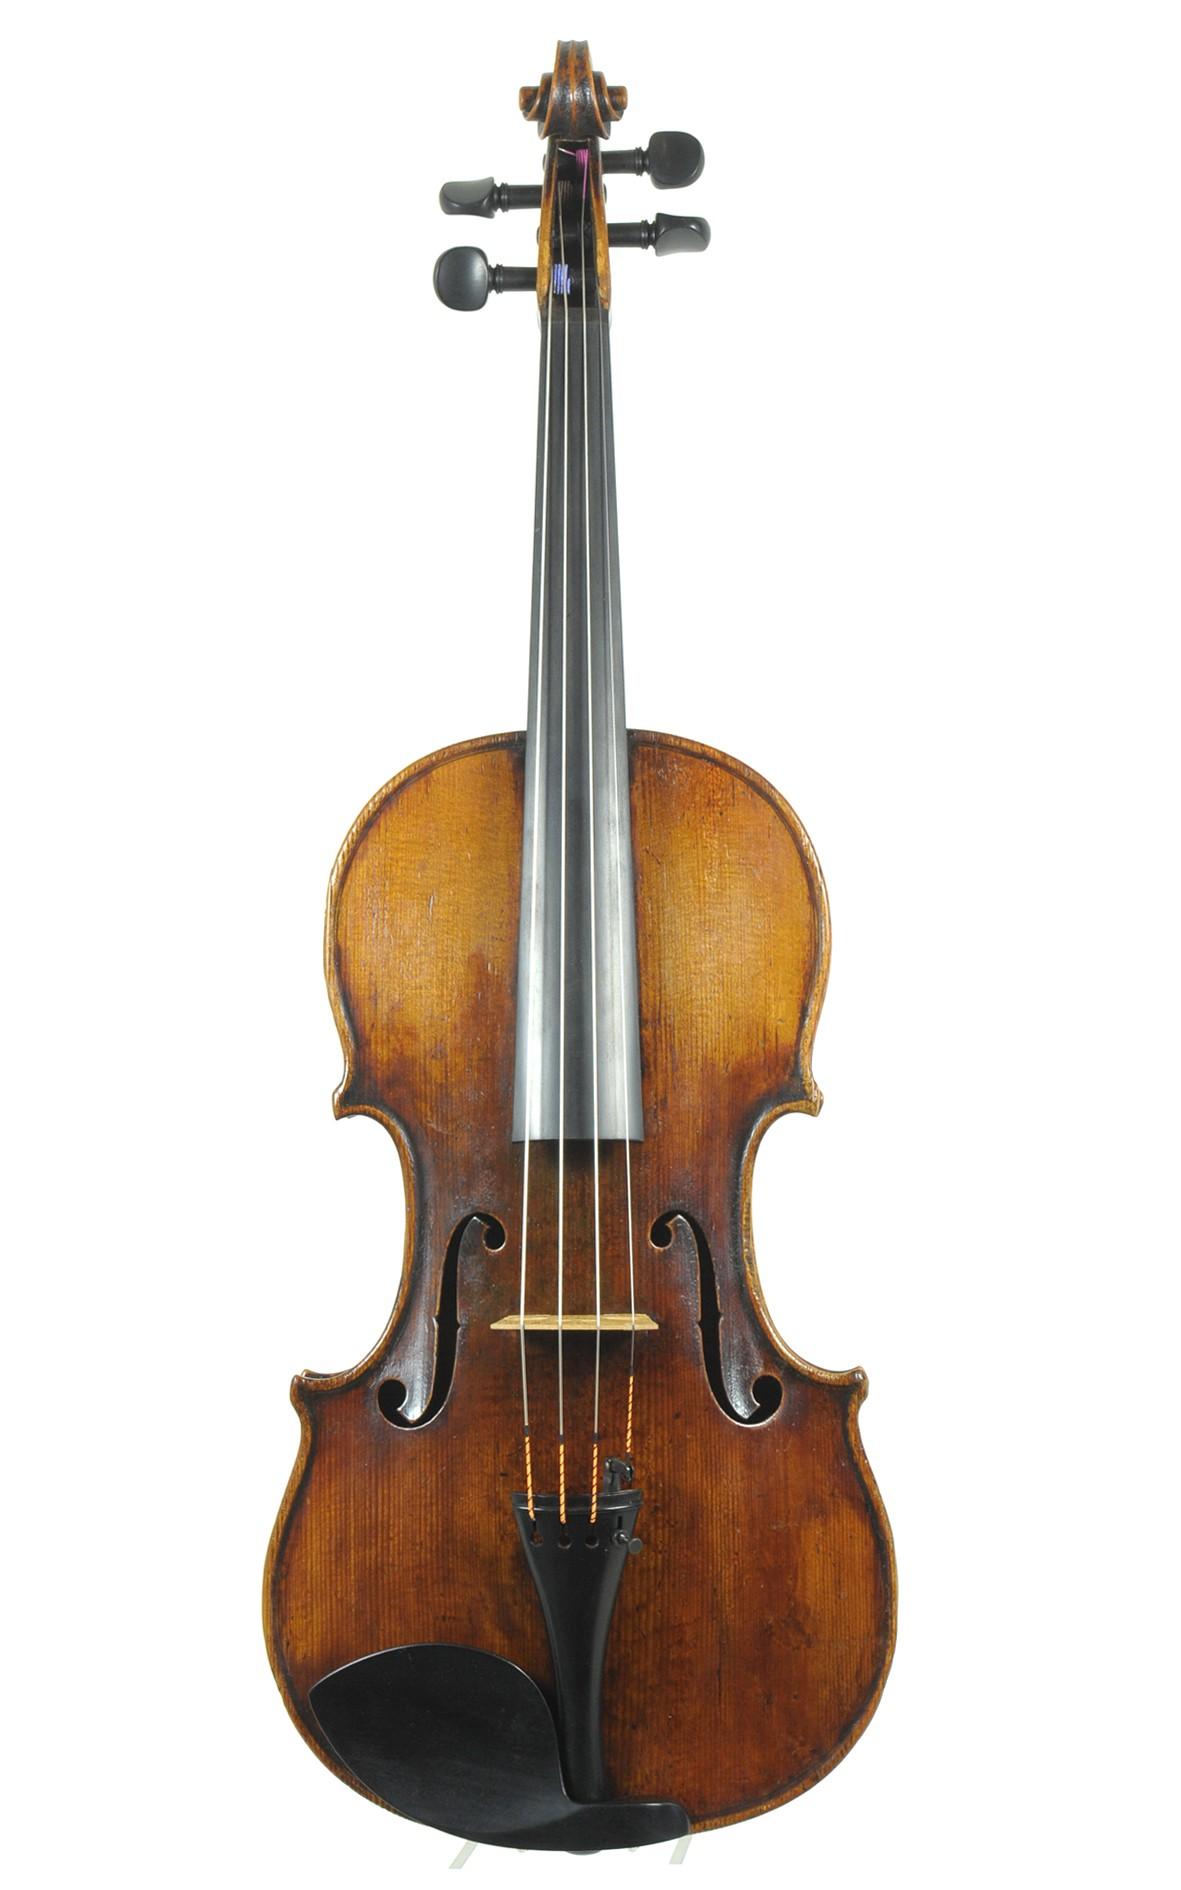 Fine French viola by François Fent